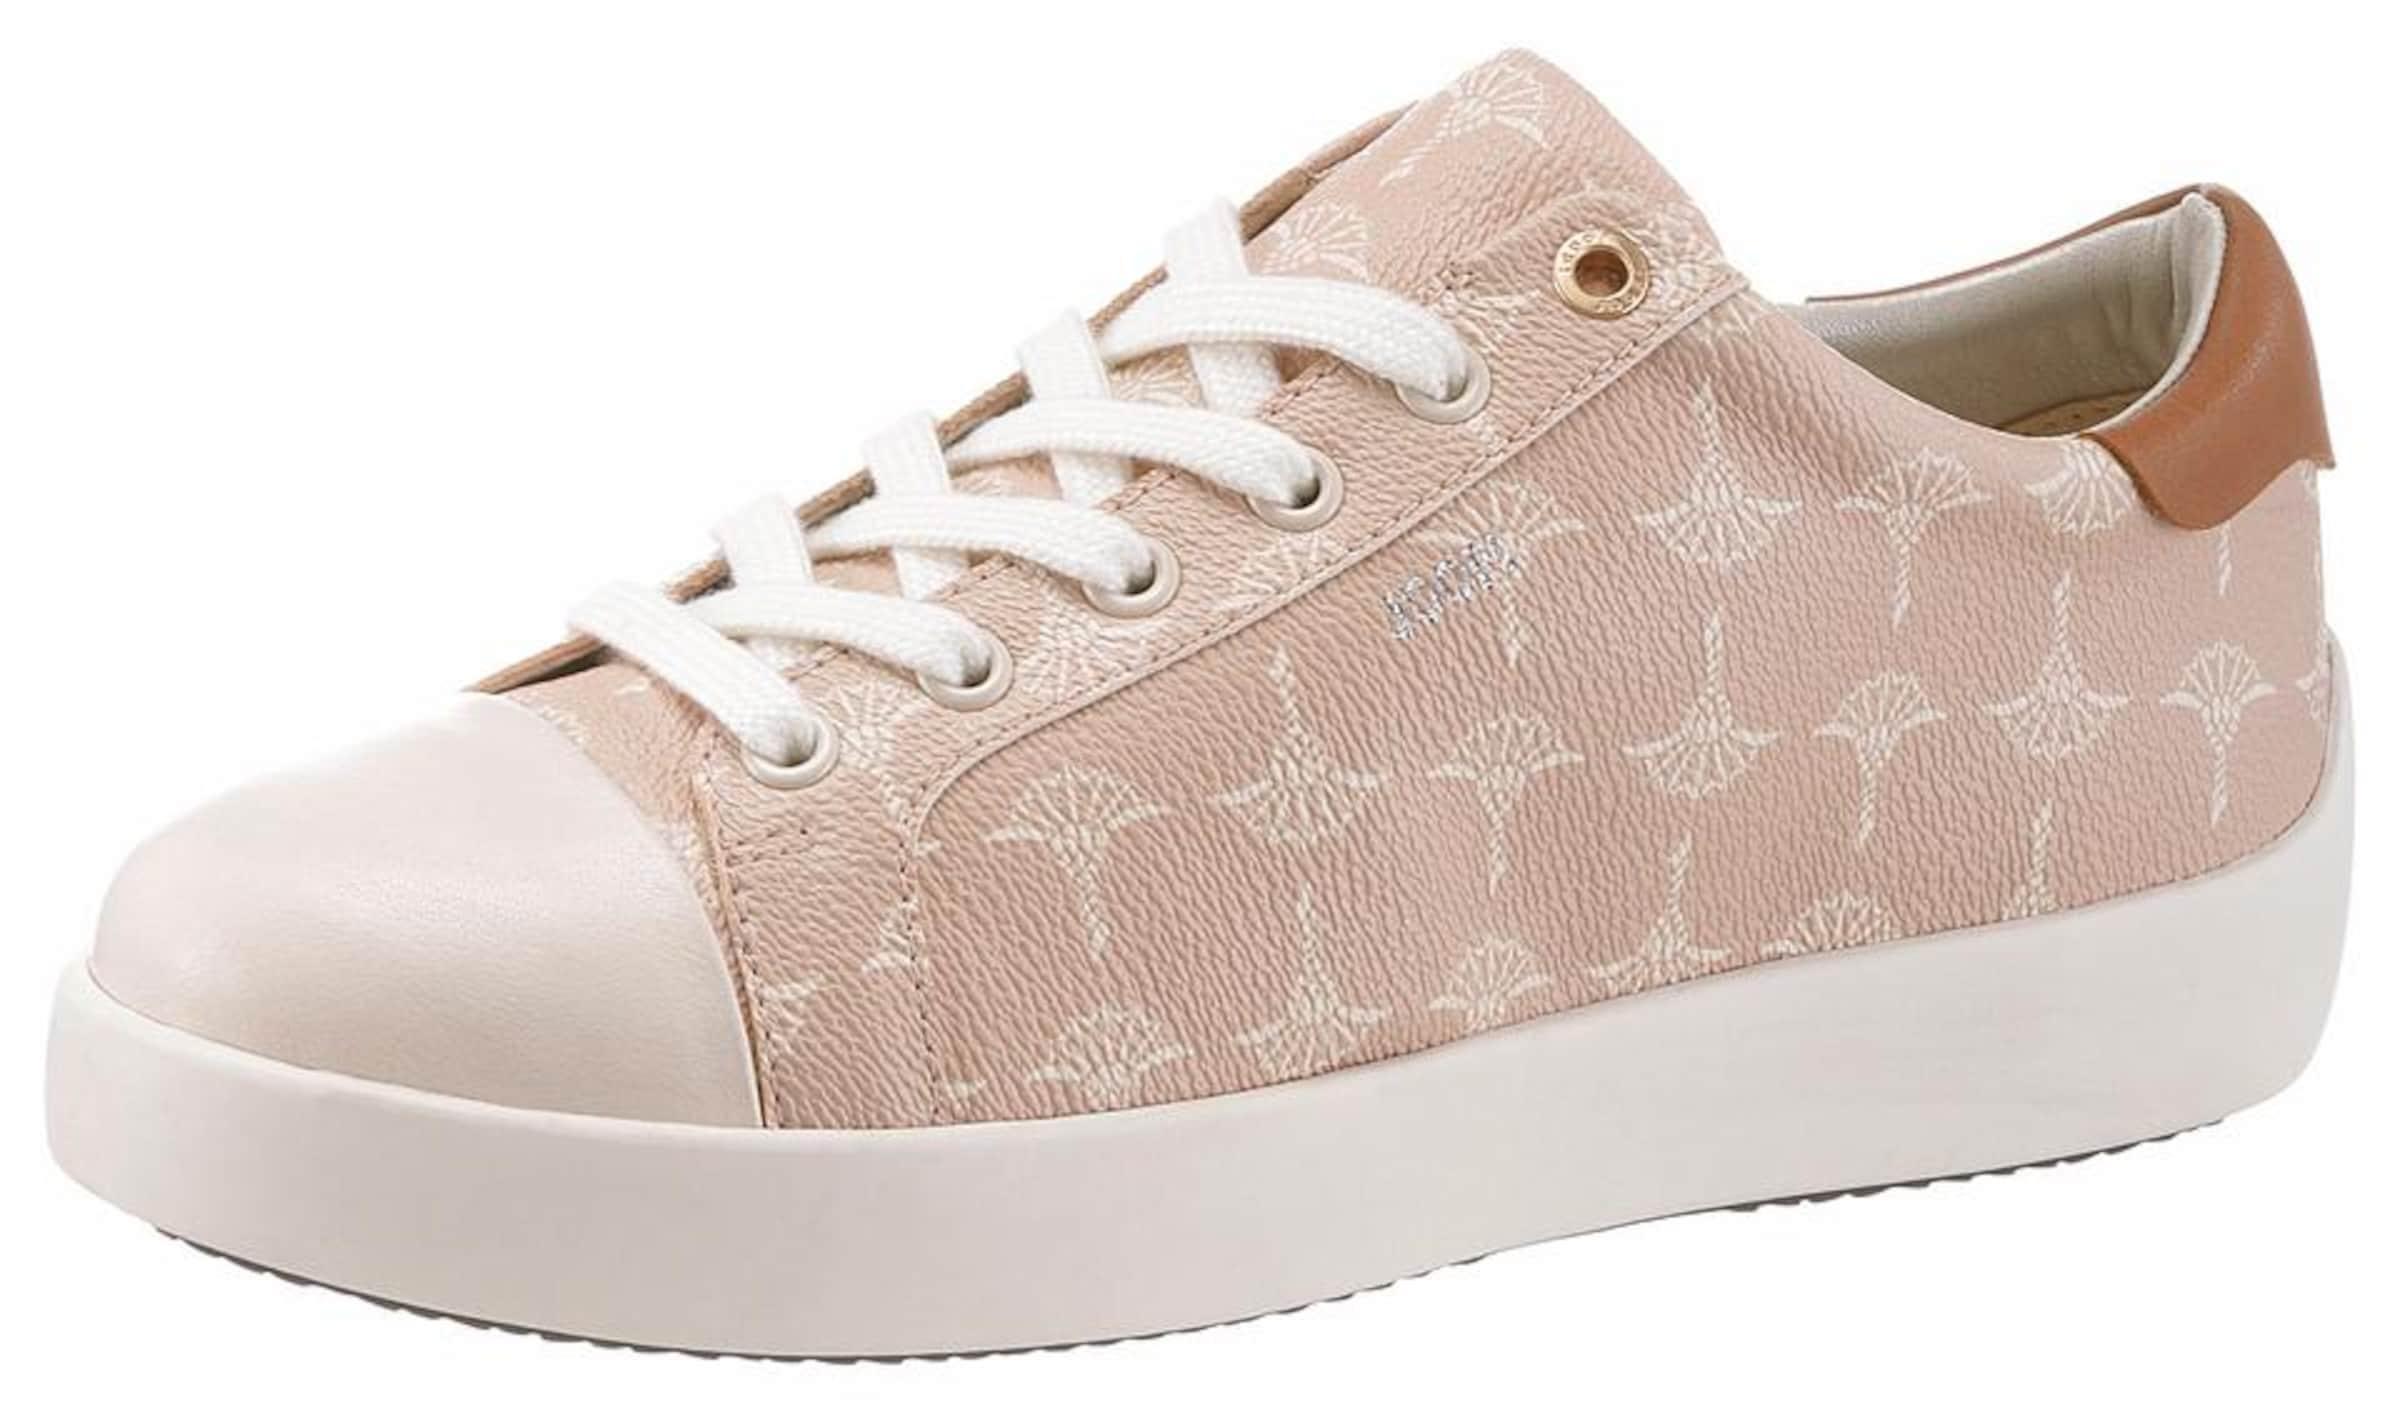 JOOP! Sneaker Verschleißfeste billige Schuhe Hohe Qualität